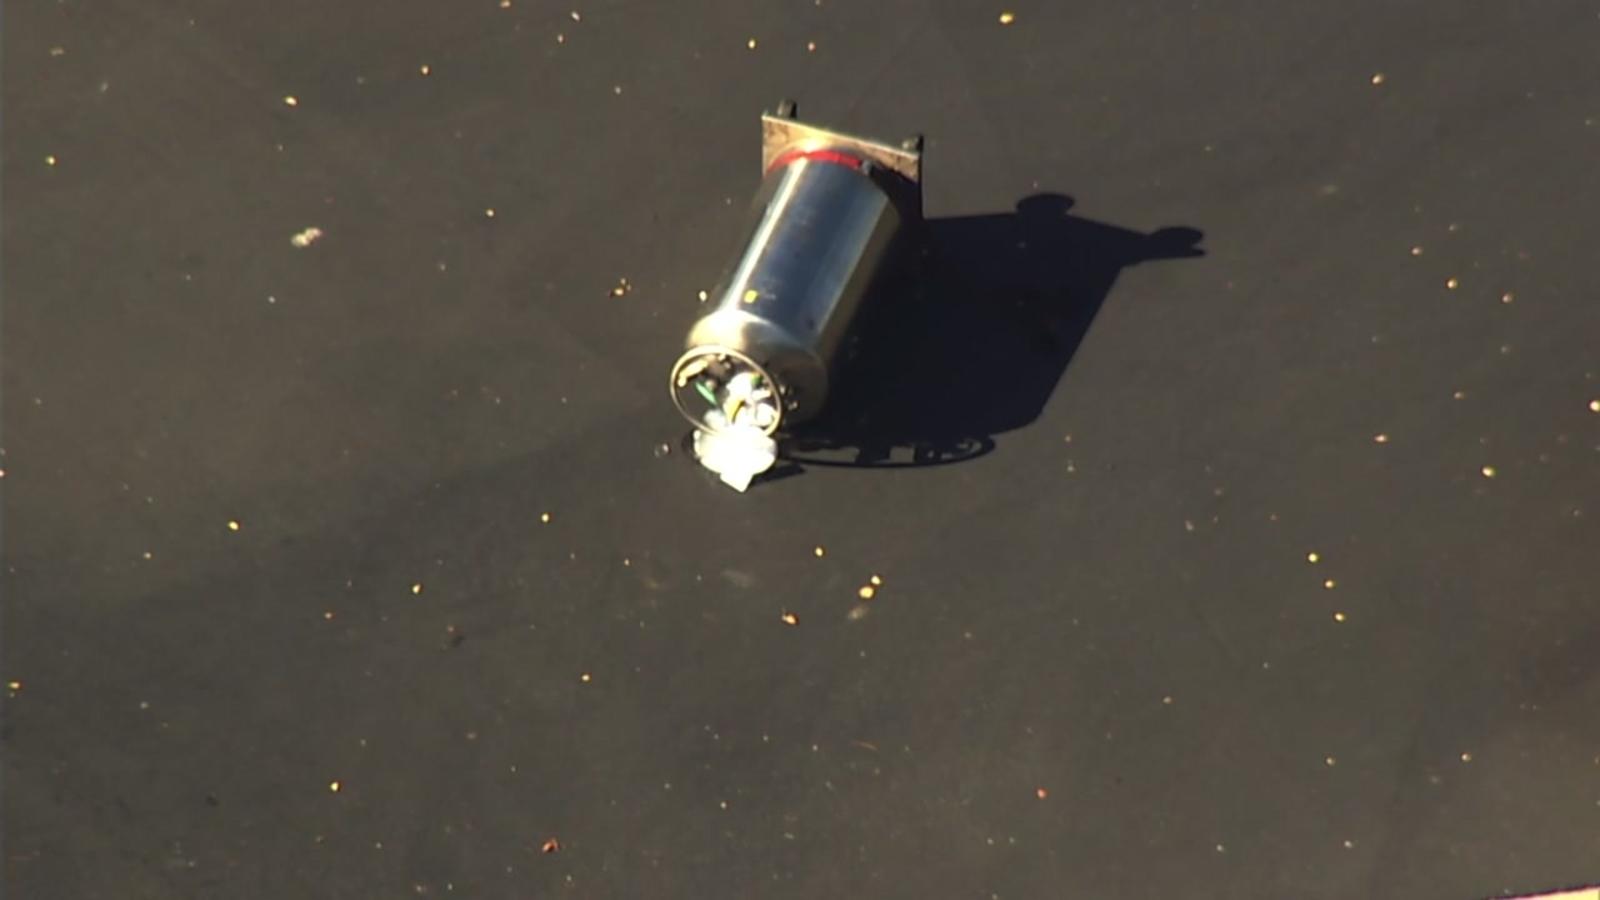 Liquid nitrogen tank falls off truck, creates hazmat situation in Pleasanton